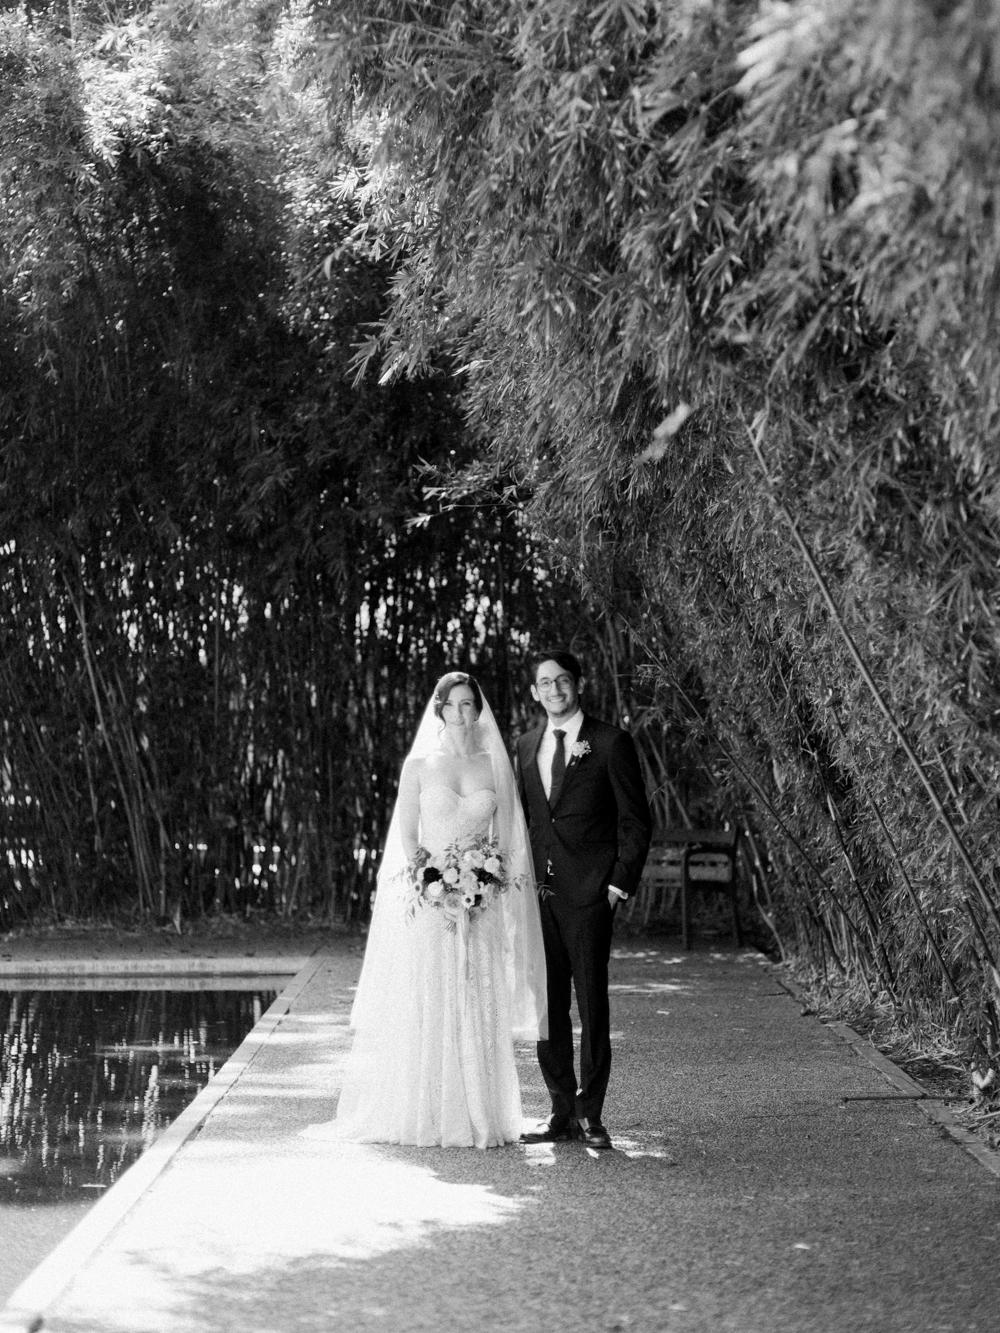 fall wedding at rothko chapel- houston wedding photographer-christine gosch - film photographer - elopement photographer- intimate wedding - lovely bride wedding gown-15.jpg